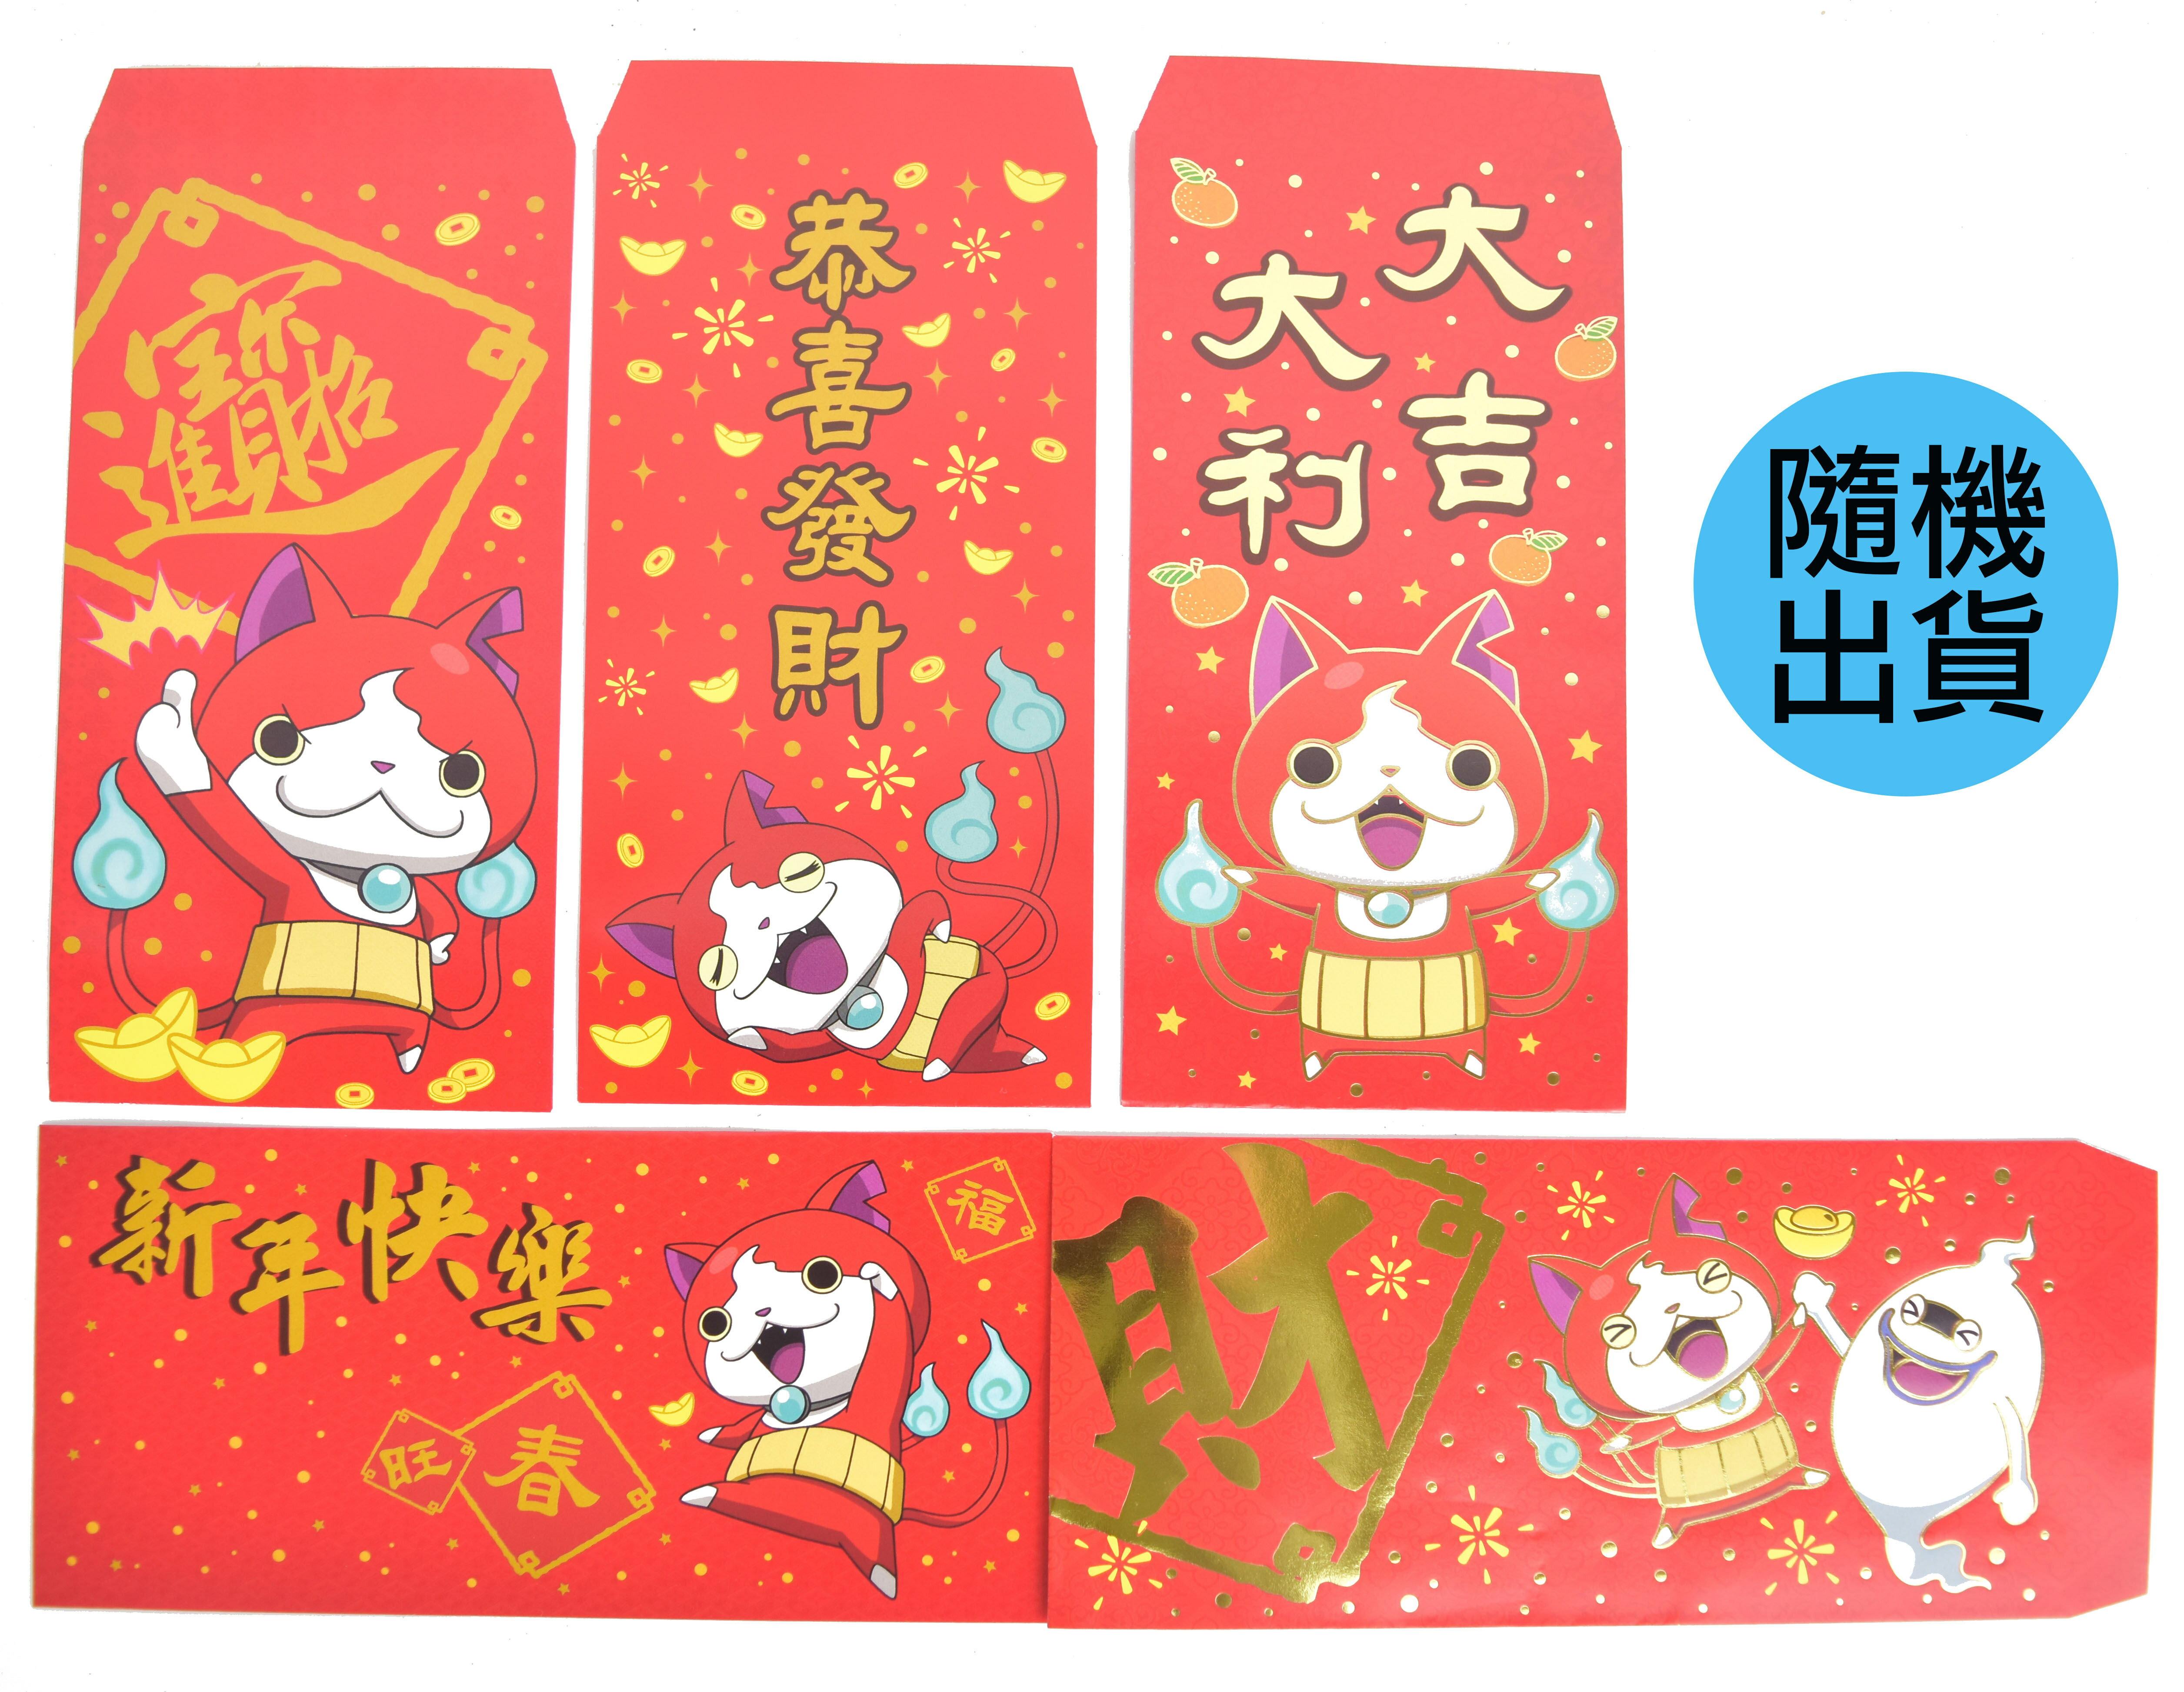 X射線【Z209145】妖怪錶中式紅包袋一包5入(5包$100),過年/紅包袋/尾牙/春酒/雞年/動畫/卡通